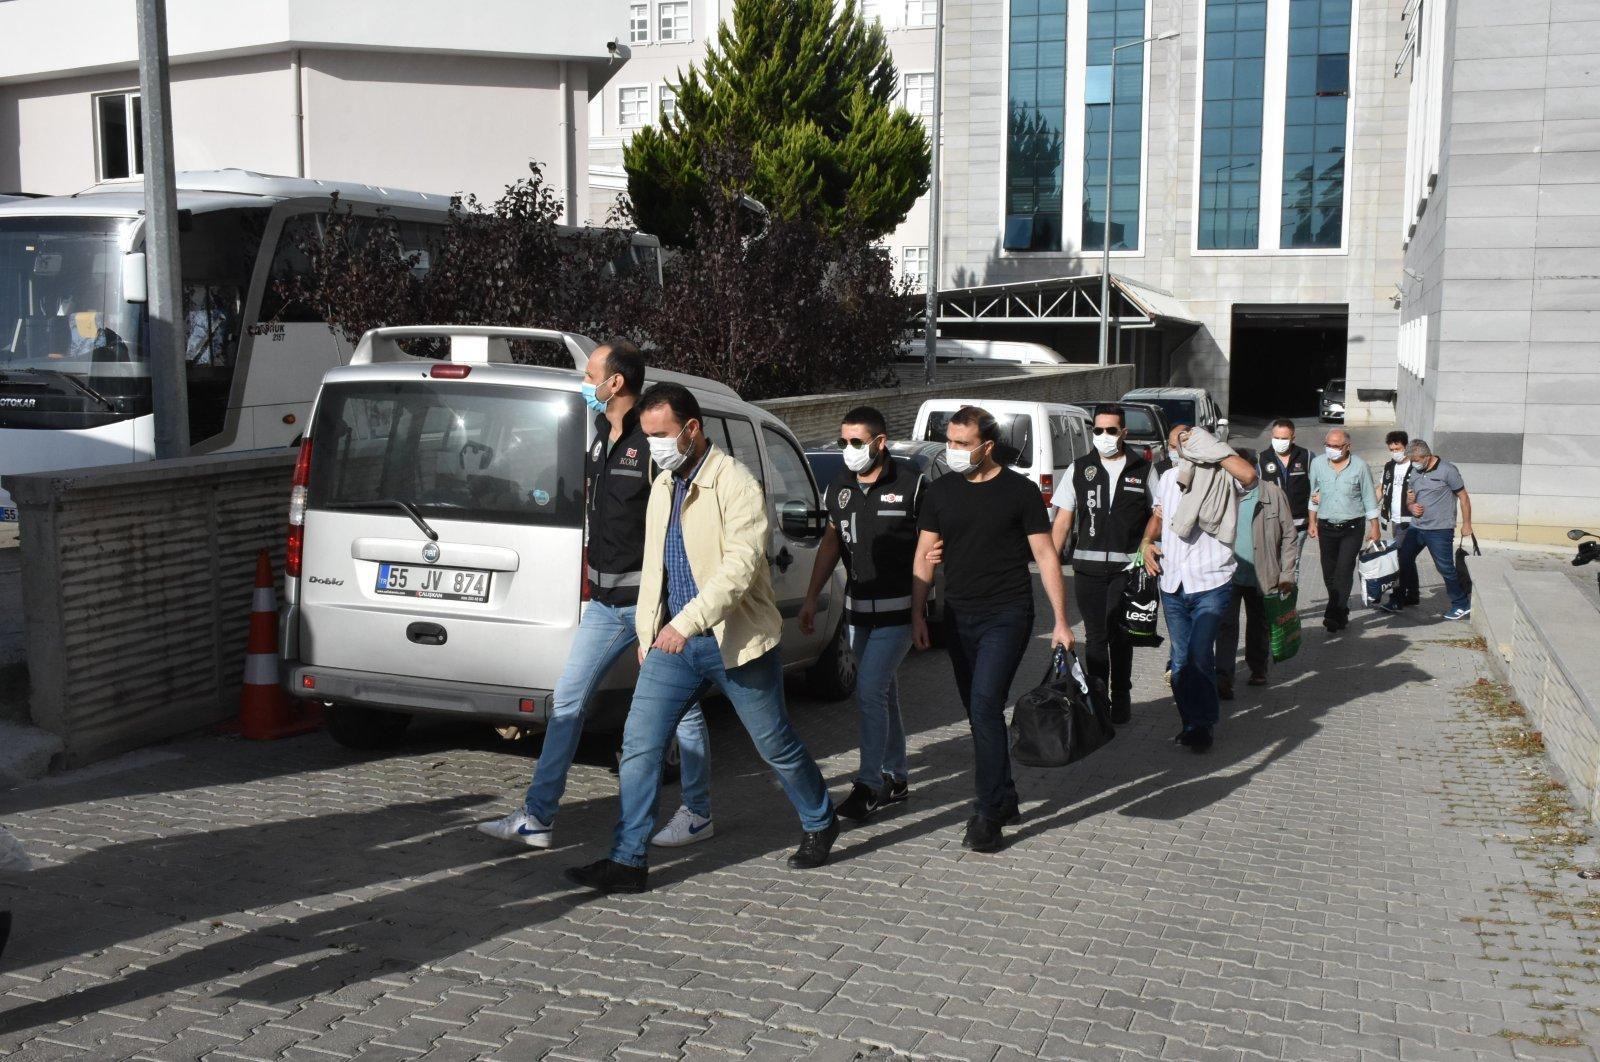 Police escort FETÖ suspects to the courthouse, in Samsun, northern Turkey, Oct. 8, 2020. (AA Photo)